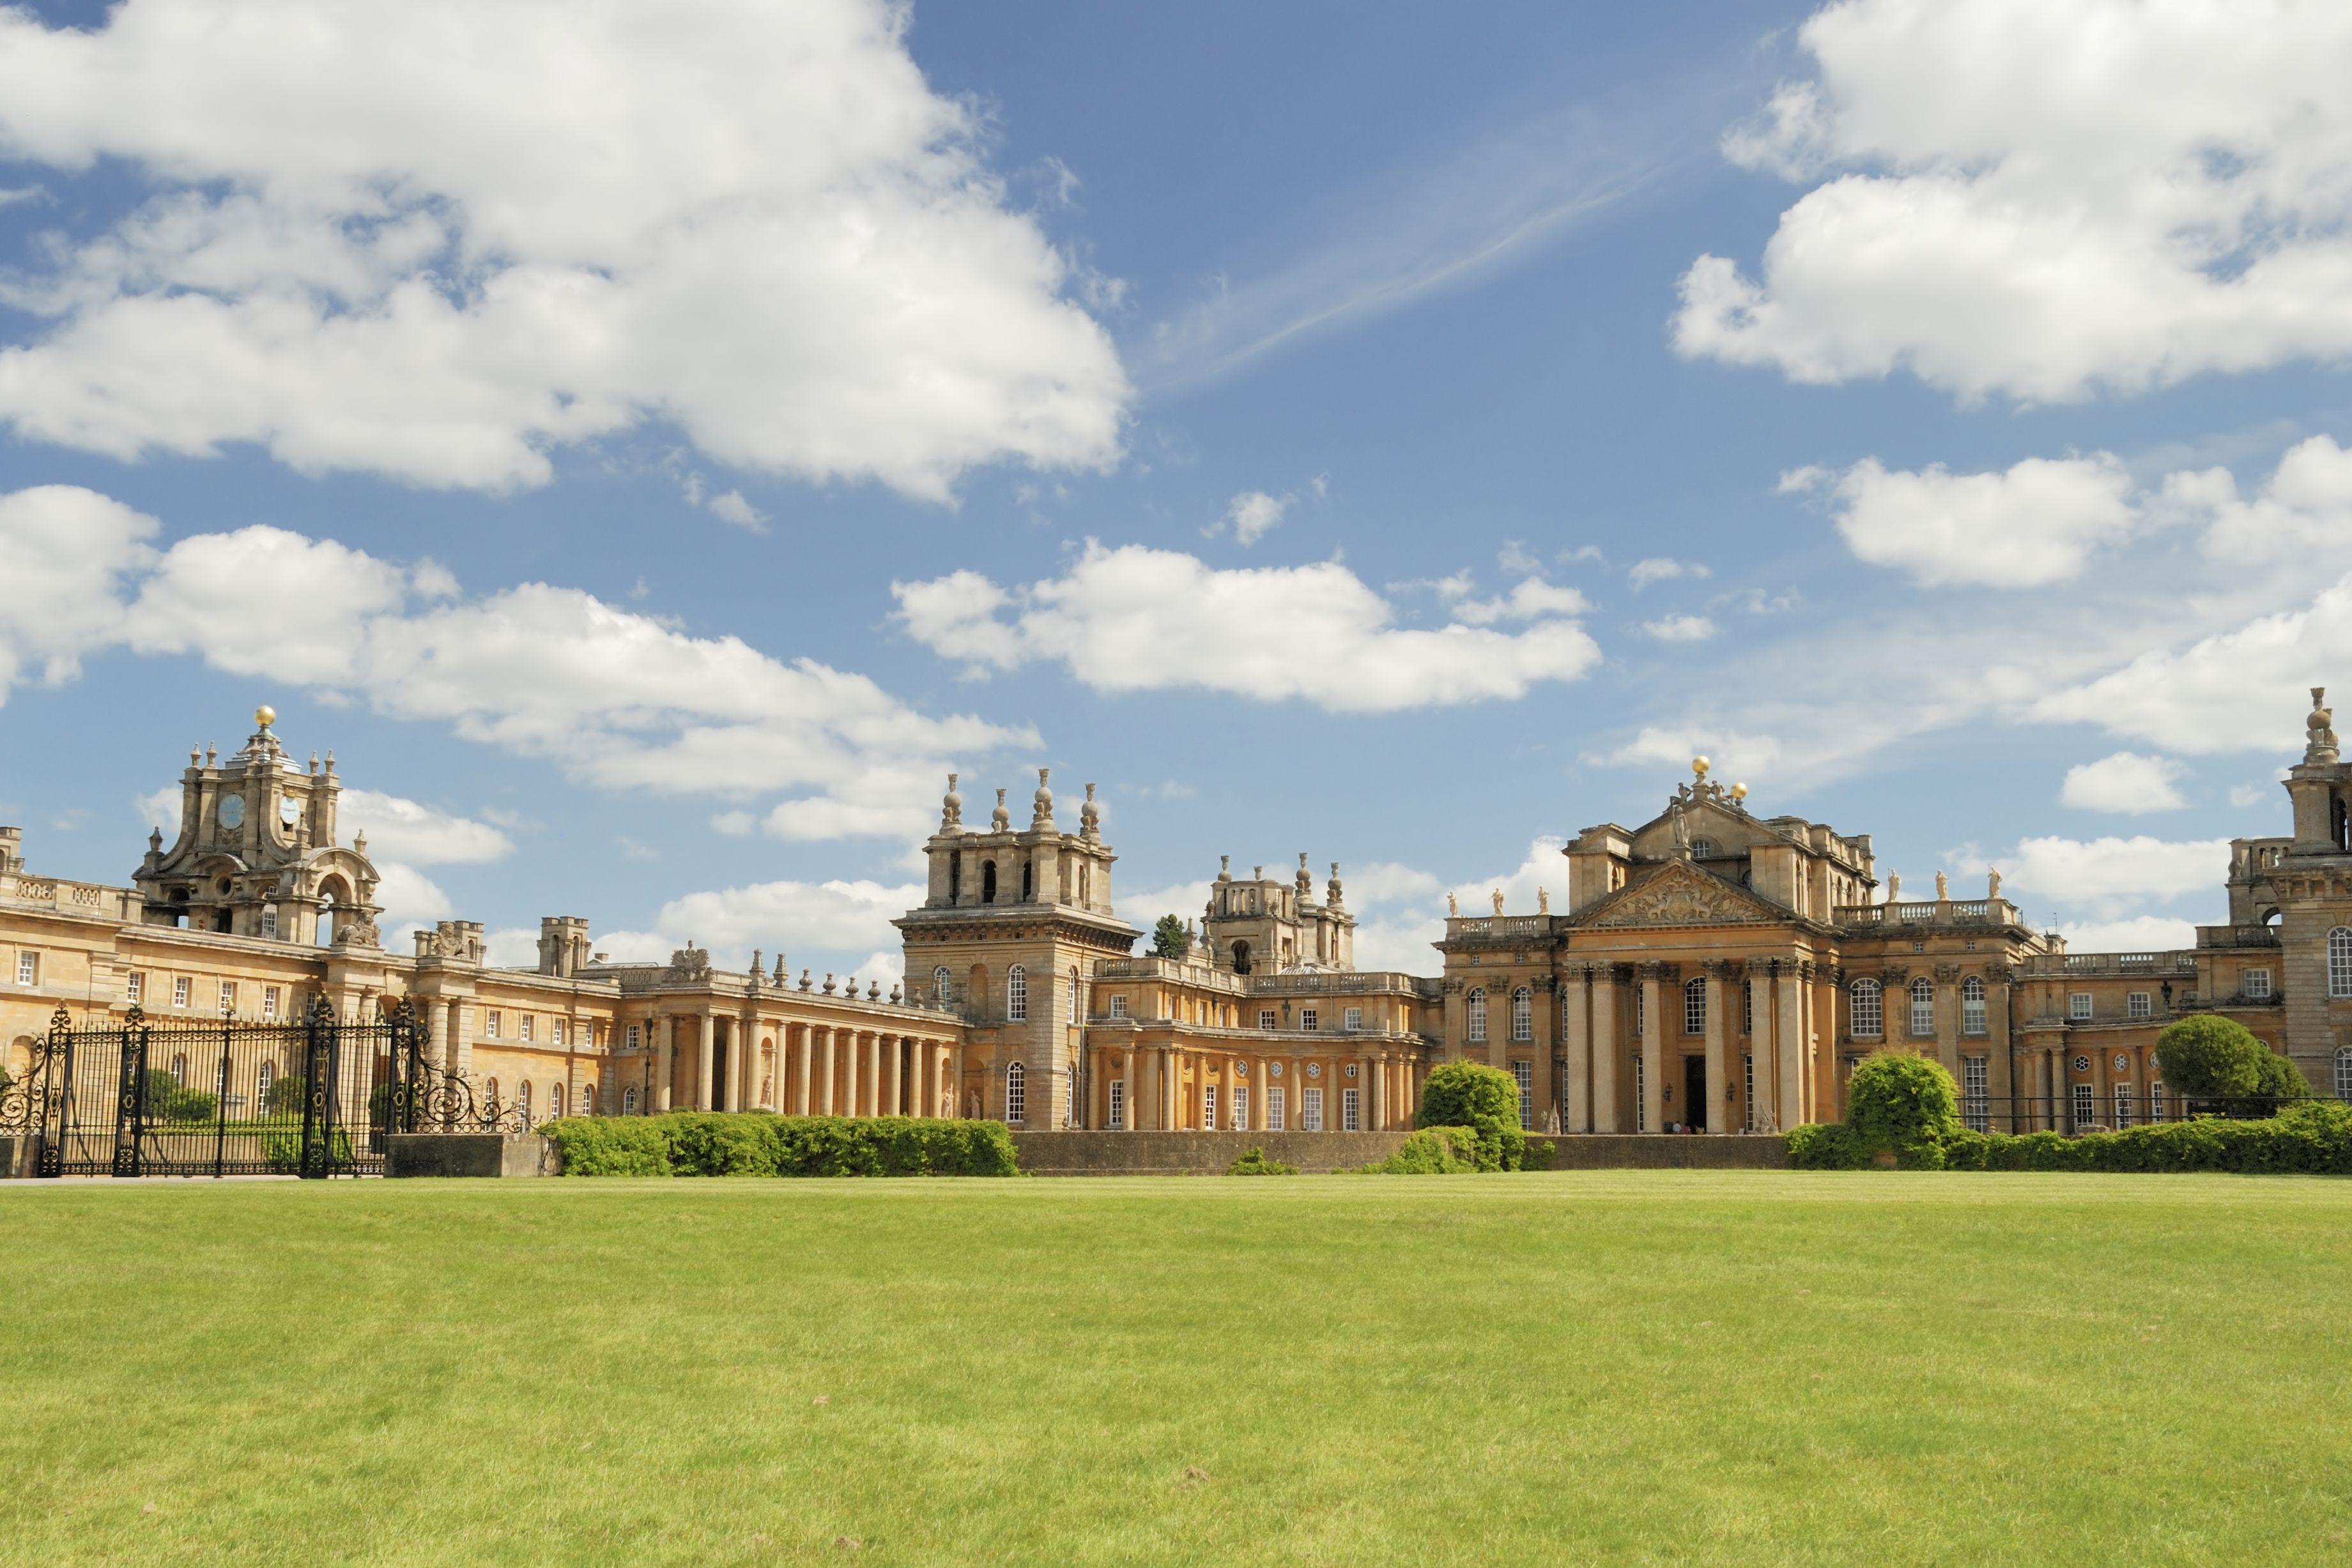 Blenheim Palace against blue skies